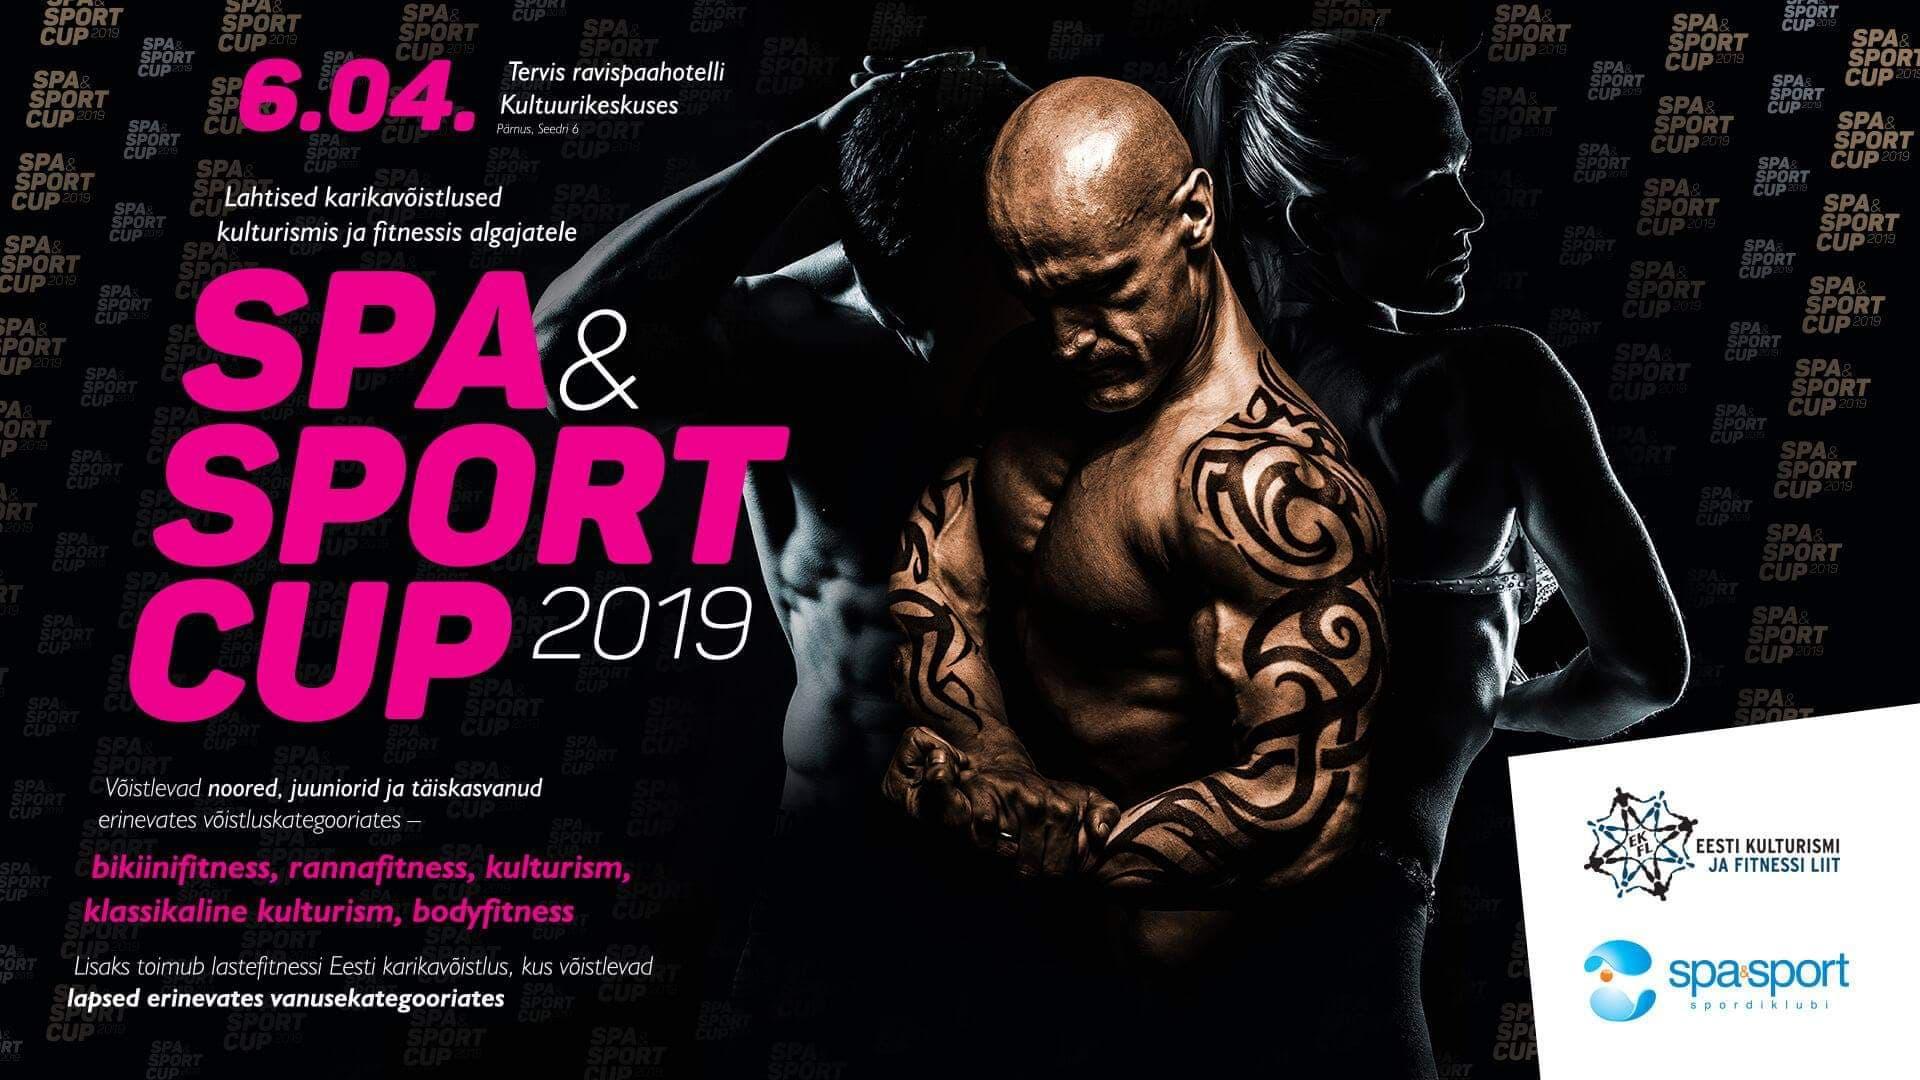 Spa & Sport CUP 2019 võistlejatele